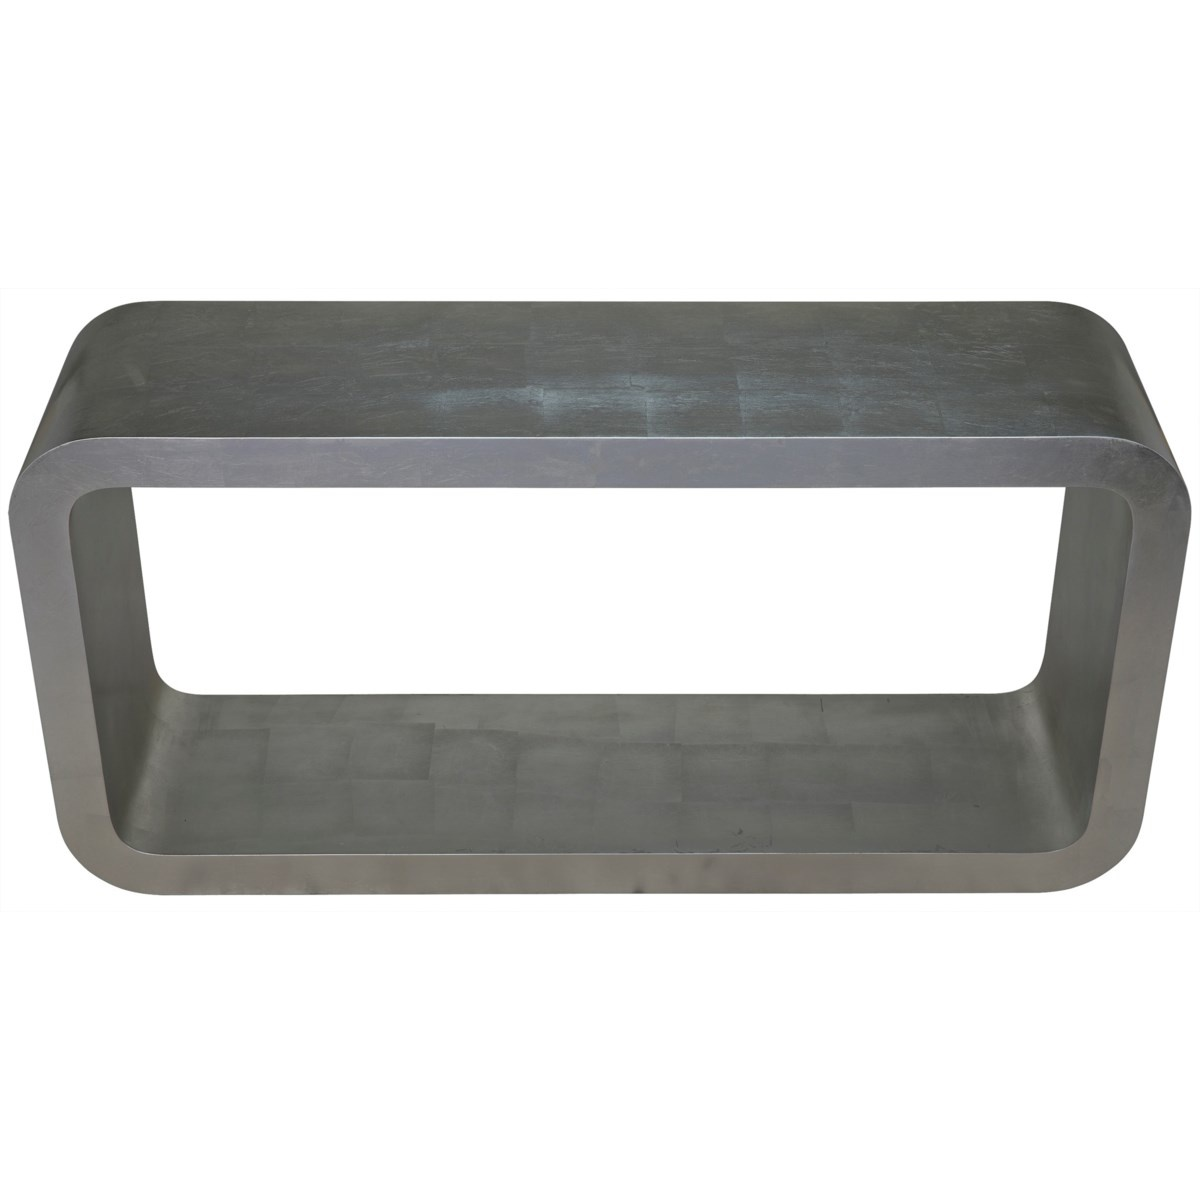 Lili Console Table